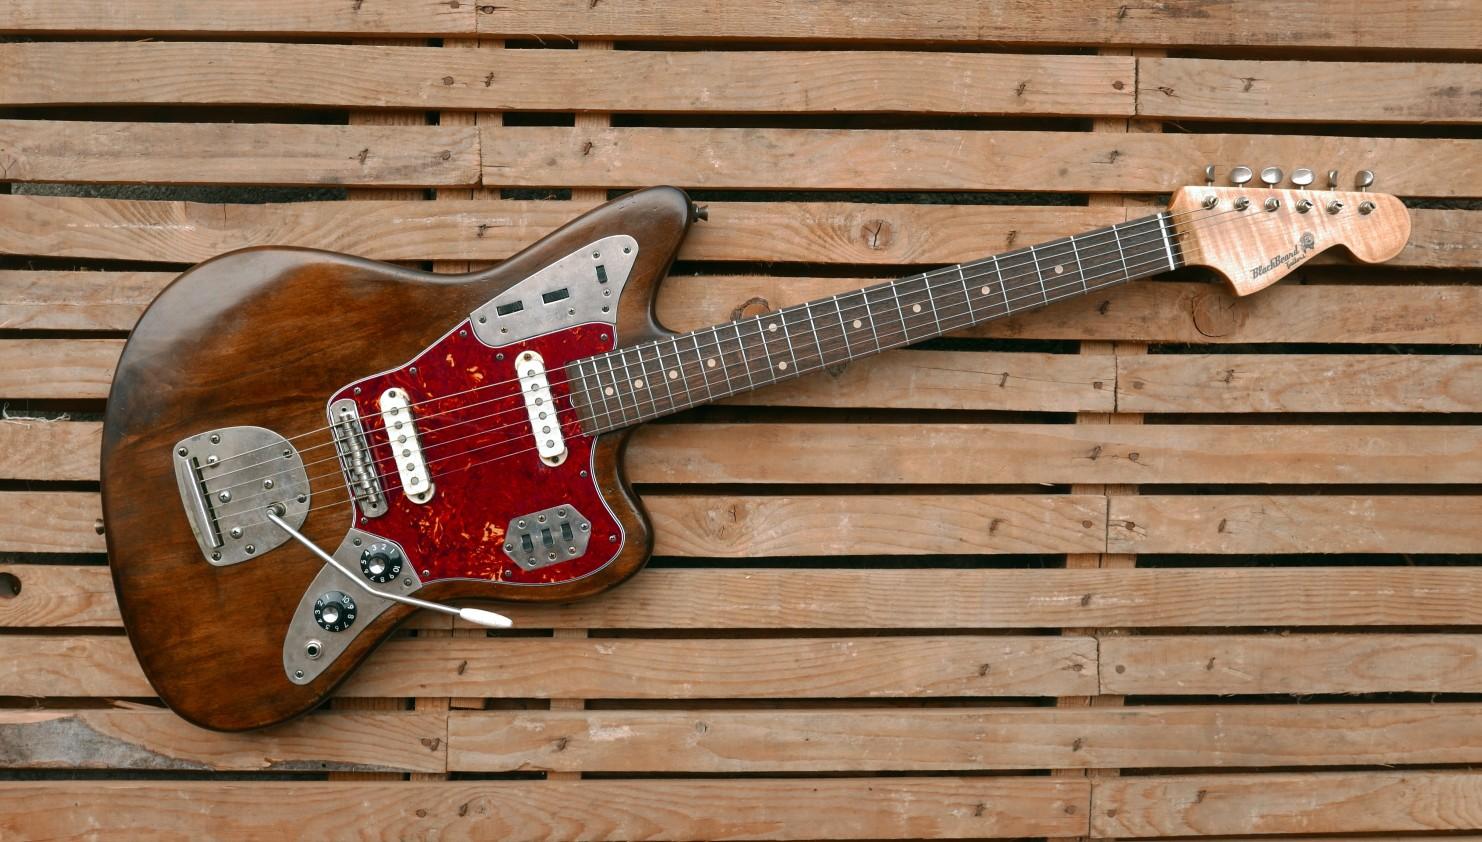 jaguar guitar front